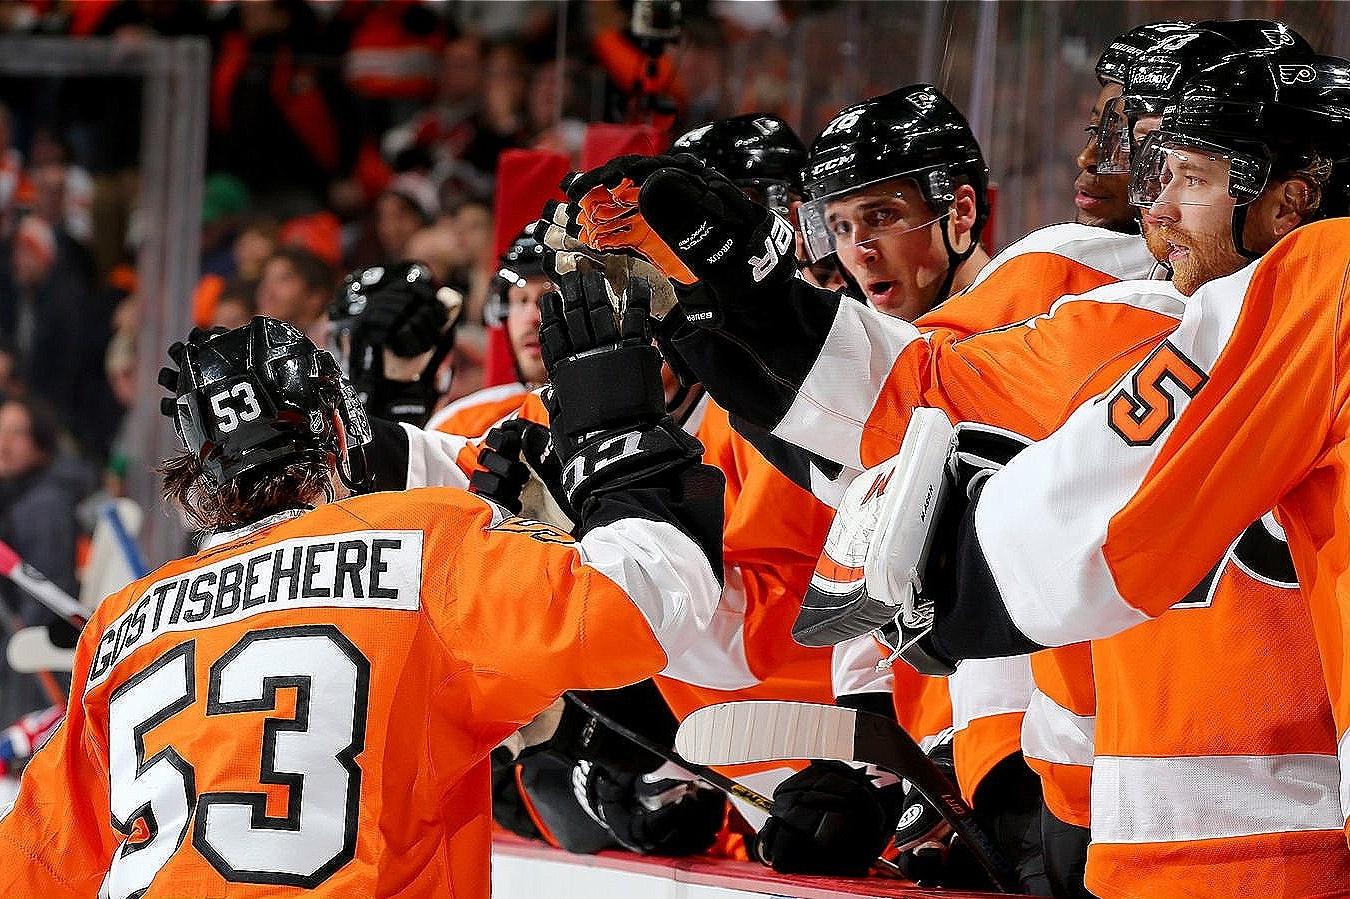 Preseason Preview: 2016/17 Philadelphia Flyers Part II